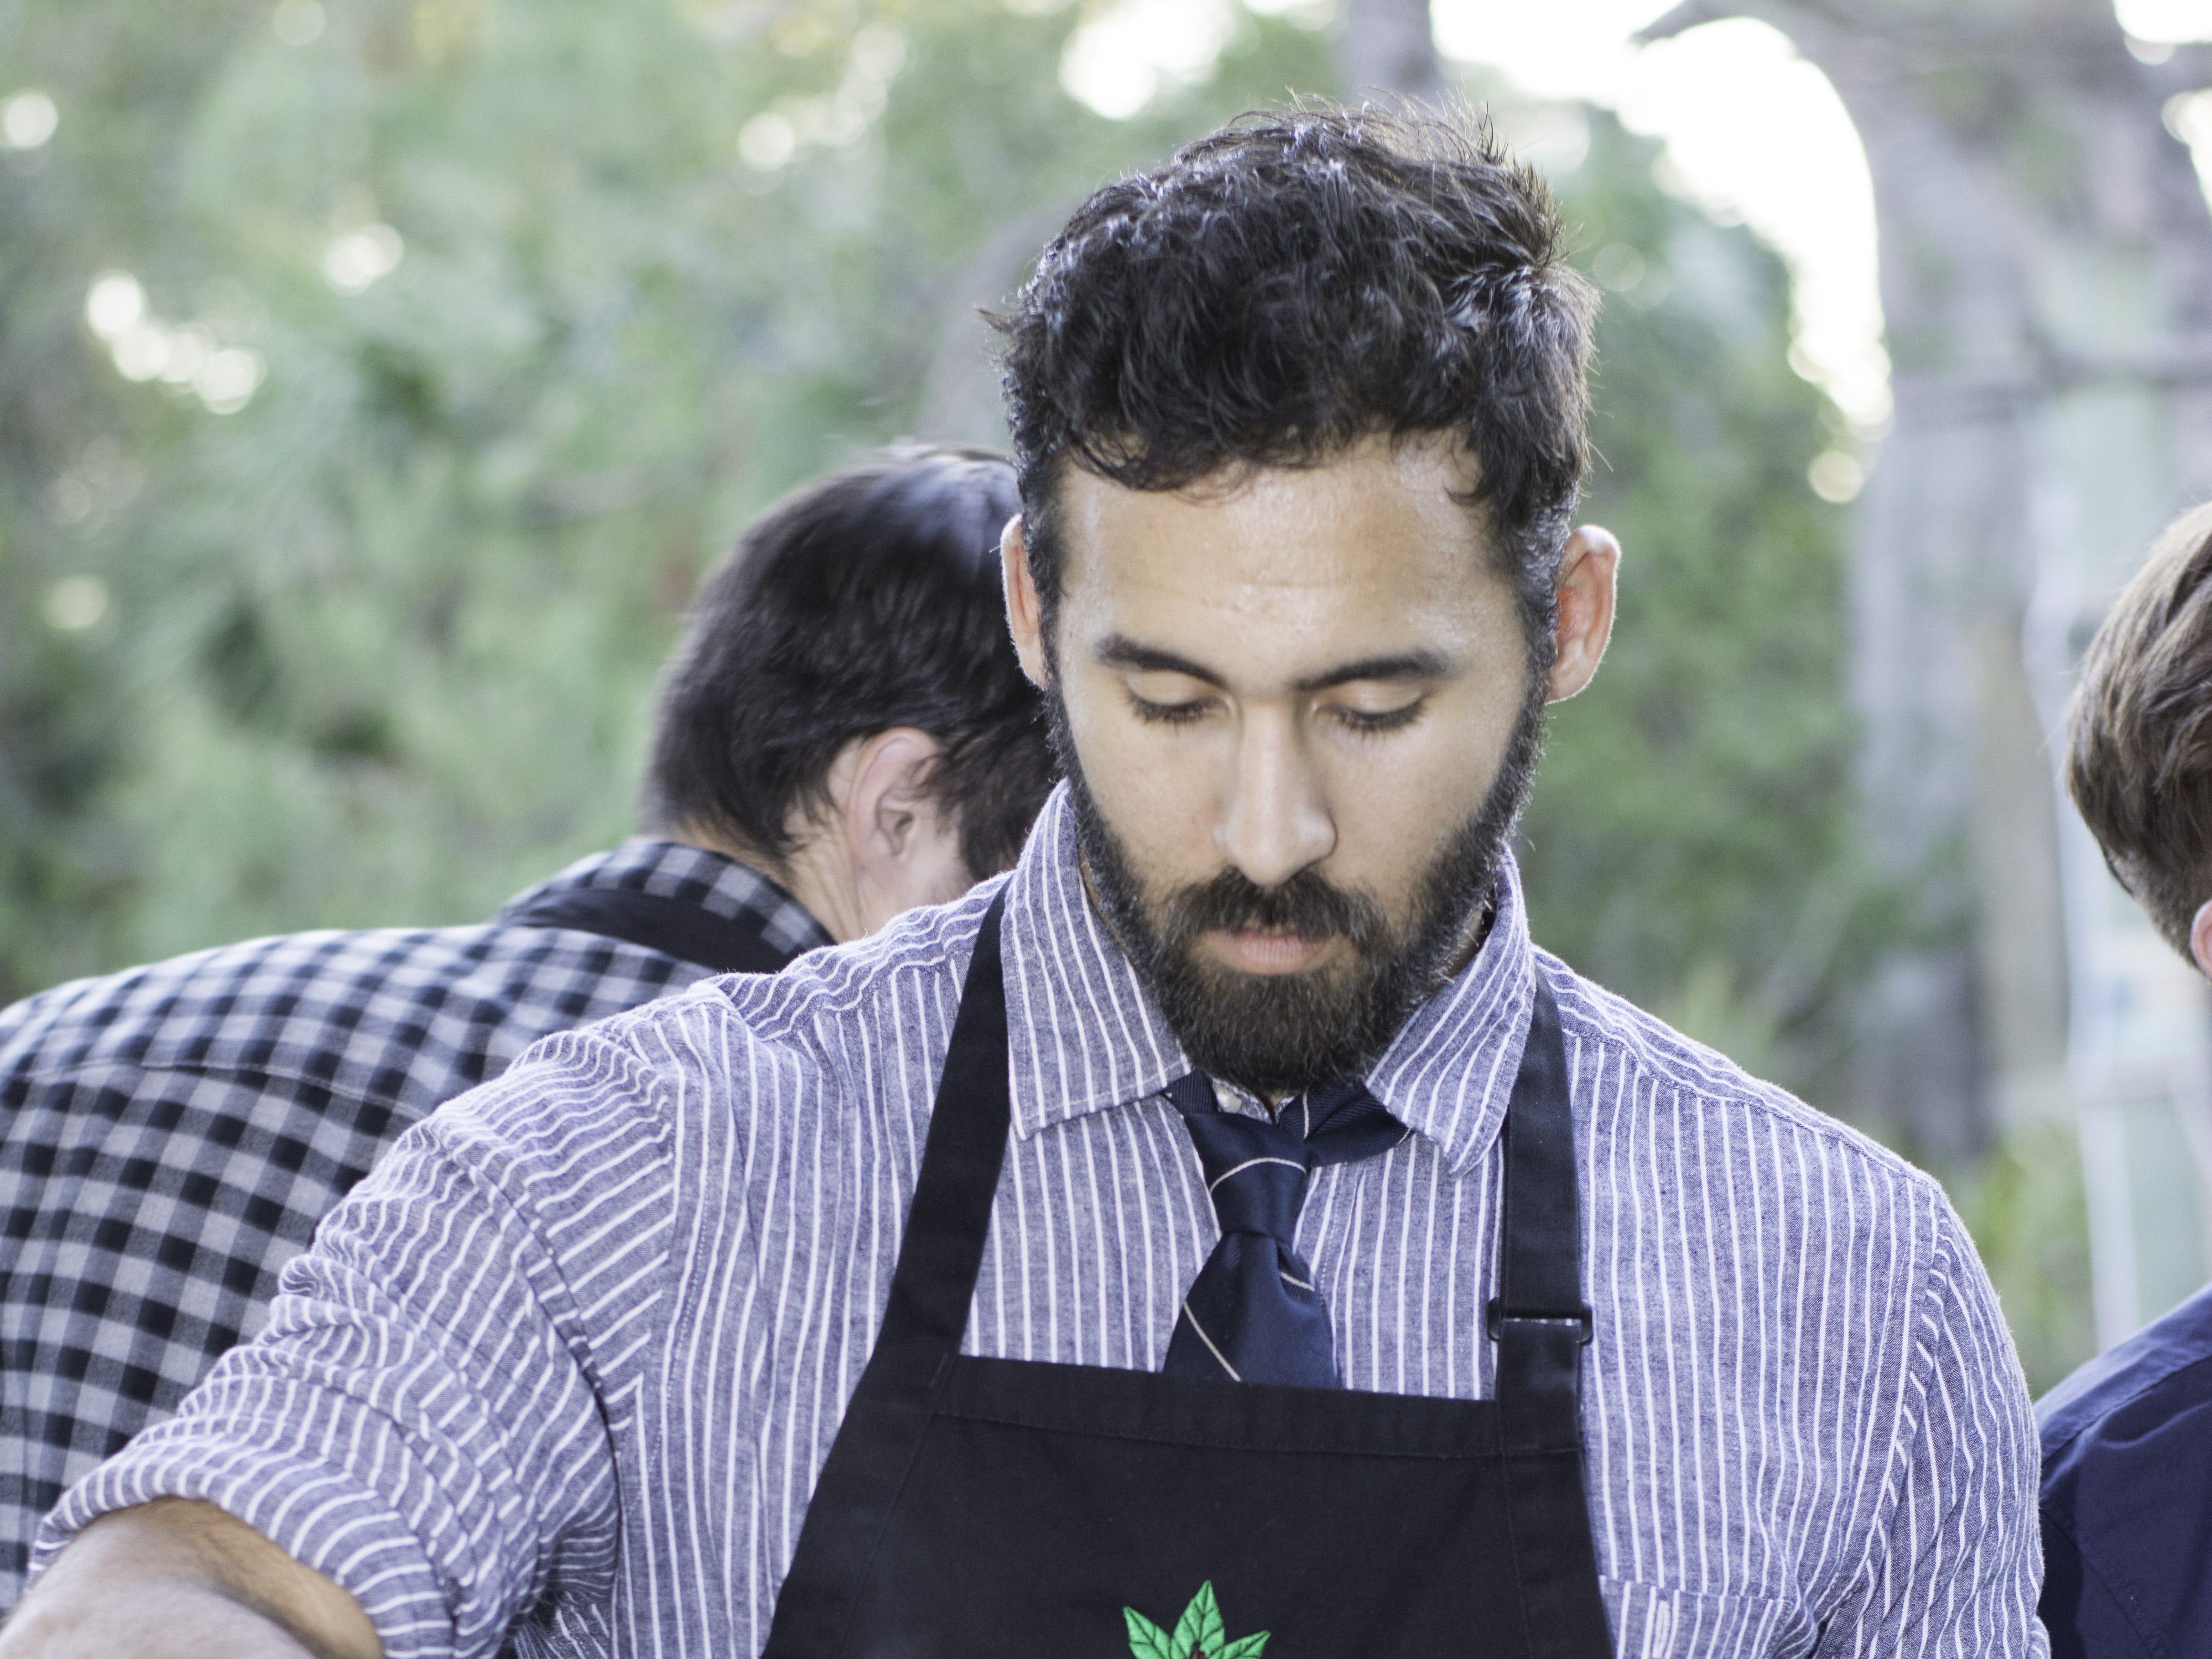 Starbucks sent their best local coffee masters to Jazzoo.